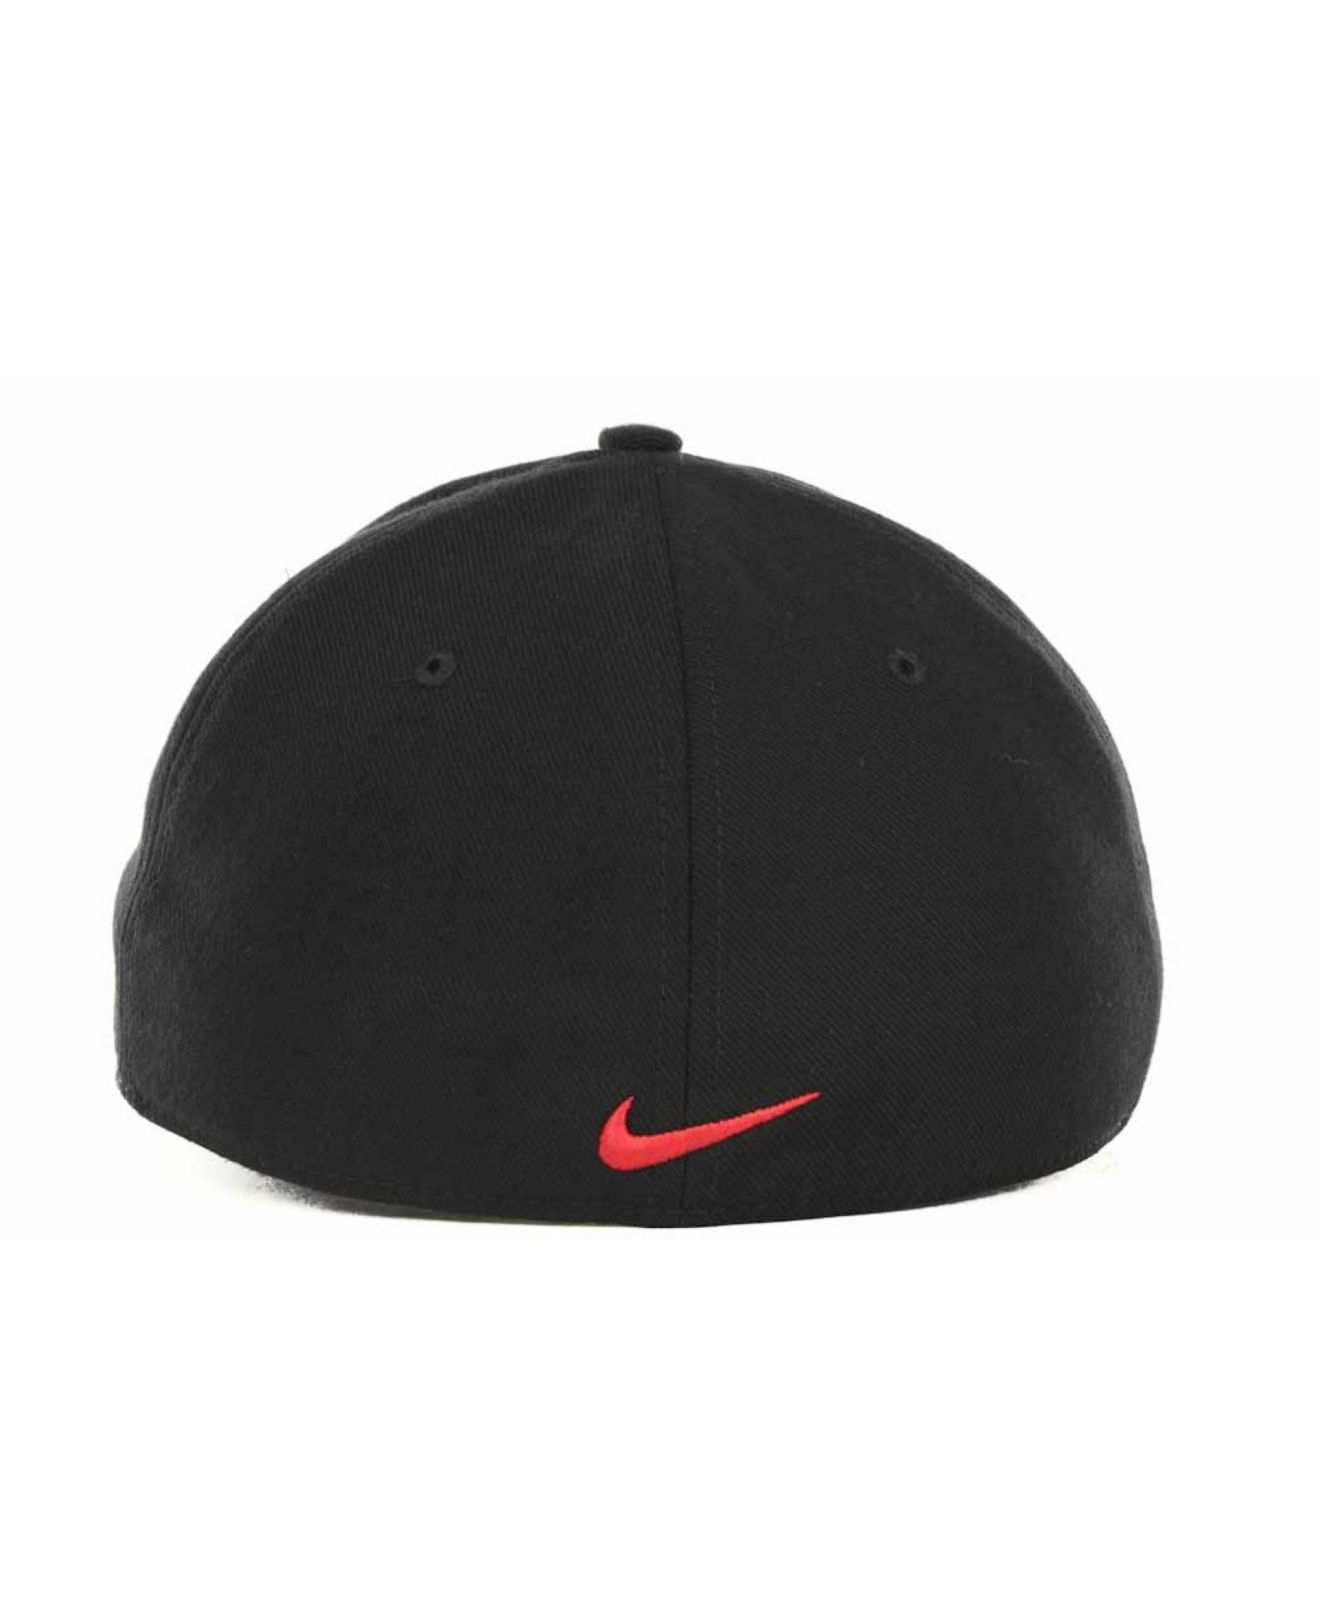 wholesale dealer 9af50 75926 ... hat black logo block a3459 0c3a7  amazon lyst nike ohio state buckeyes  drifit swoosh flex cap in black for men 97103 5da63